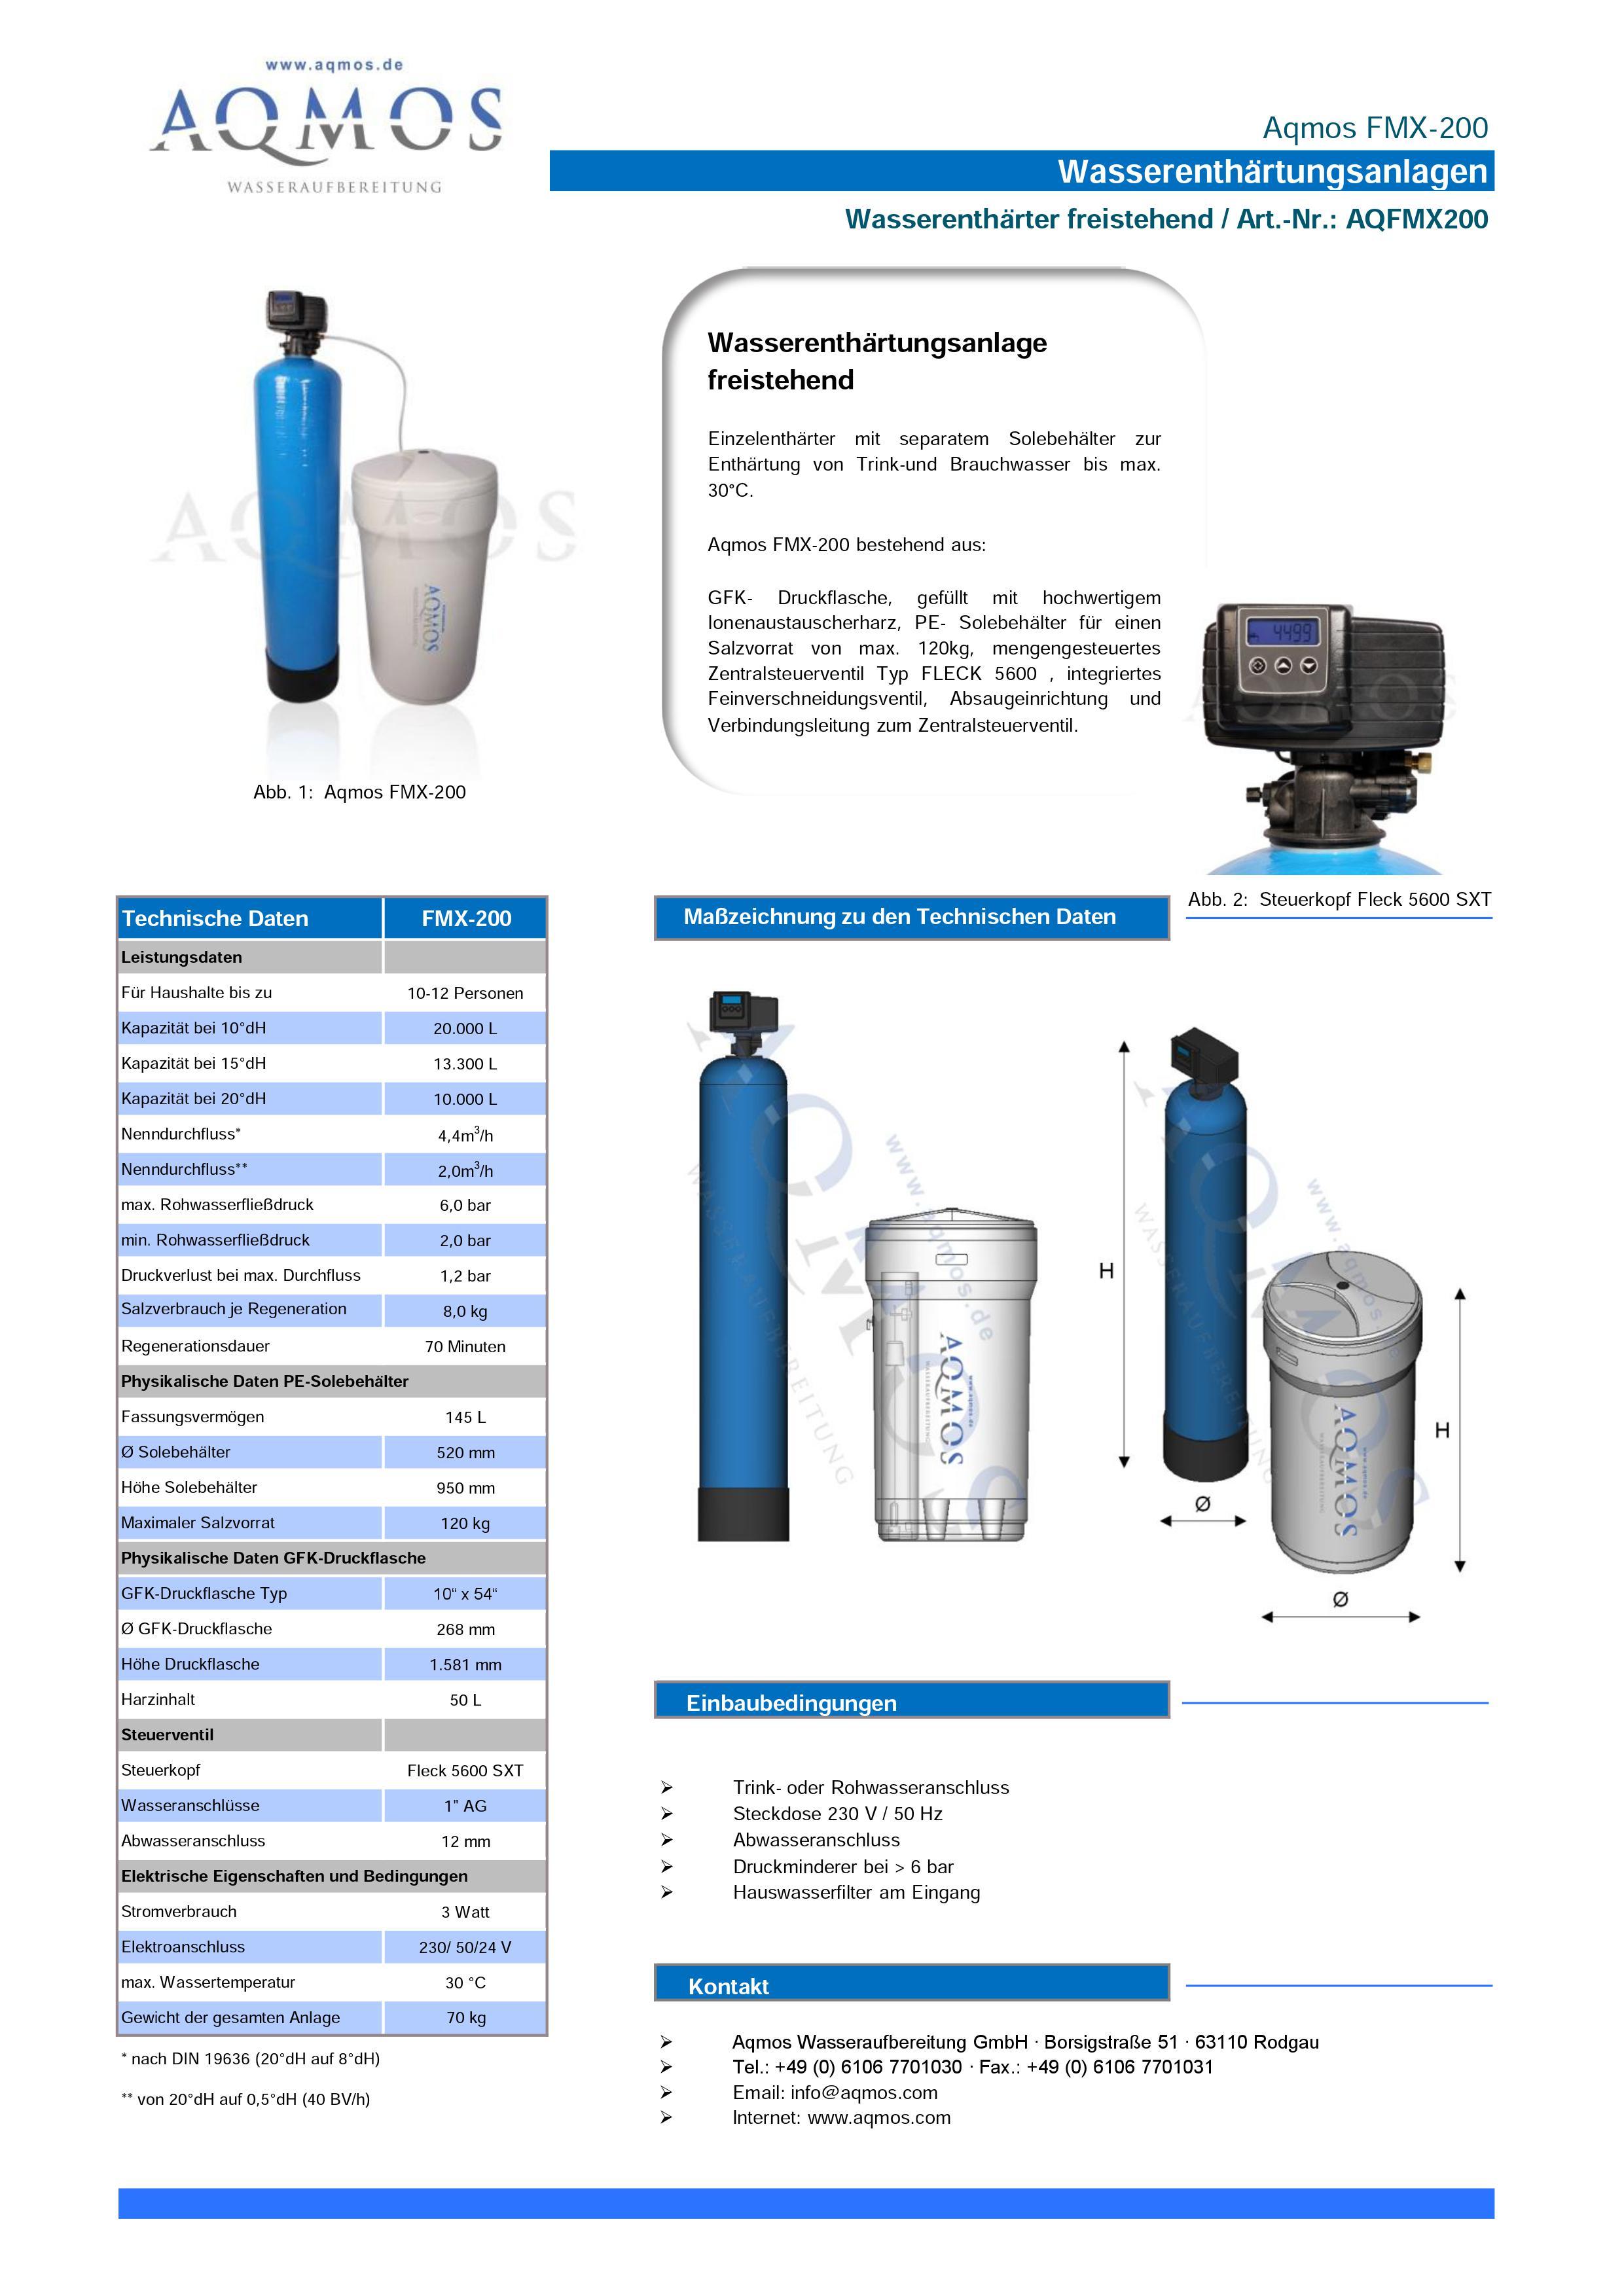 FMX-200-Datenblatt